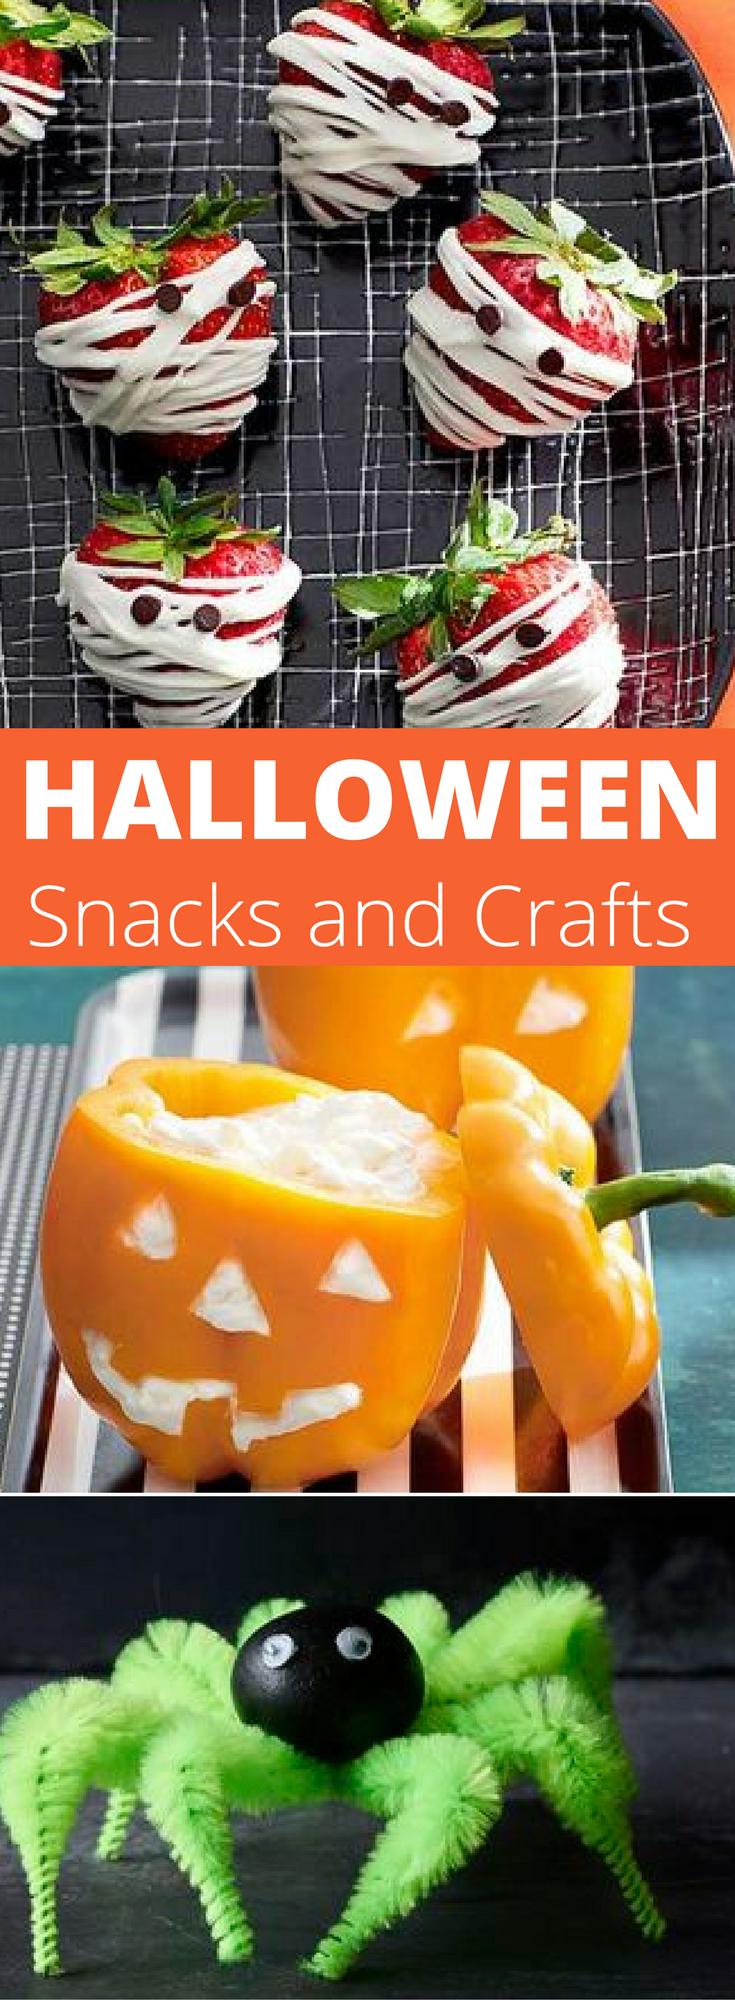 11 Easy Halloween Treats for School #halloweenpotluckideas